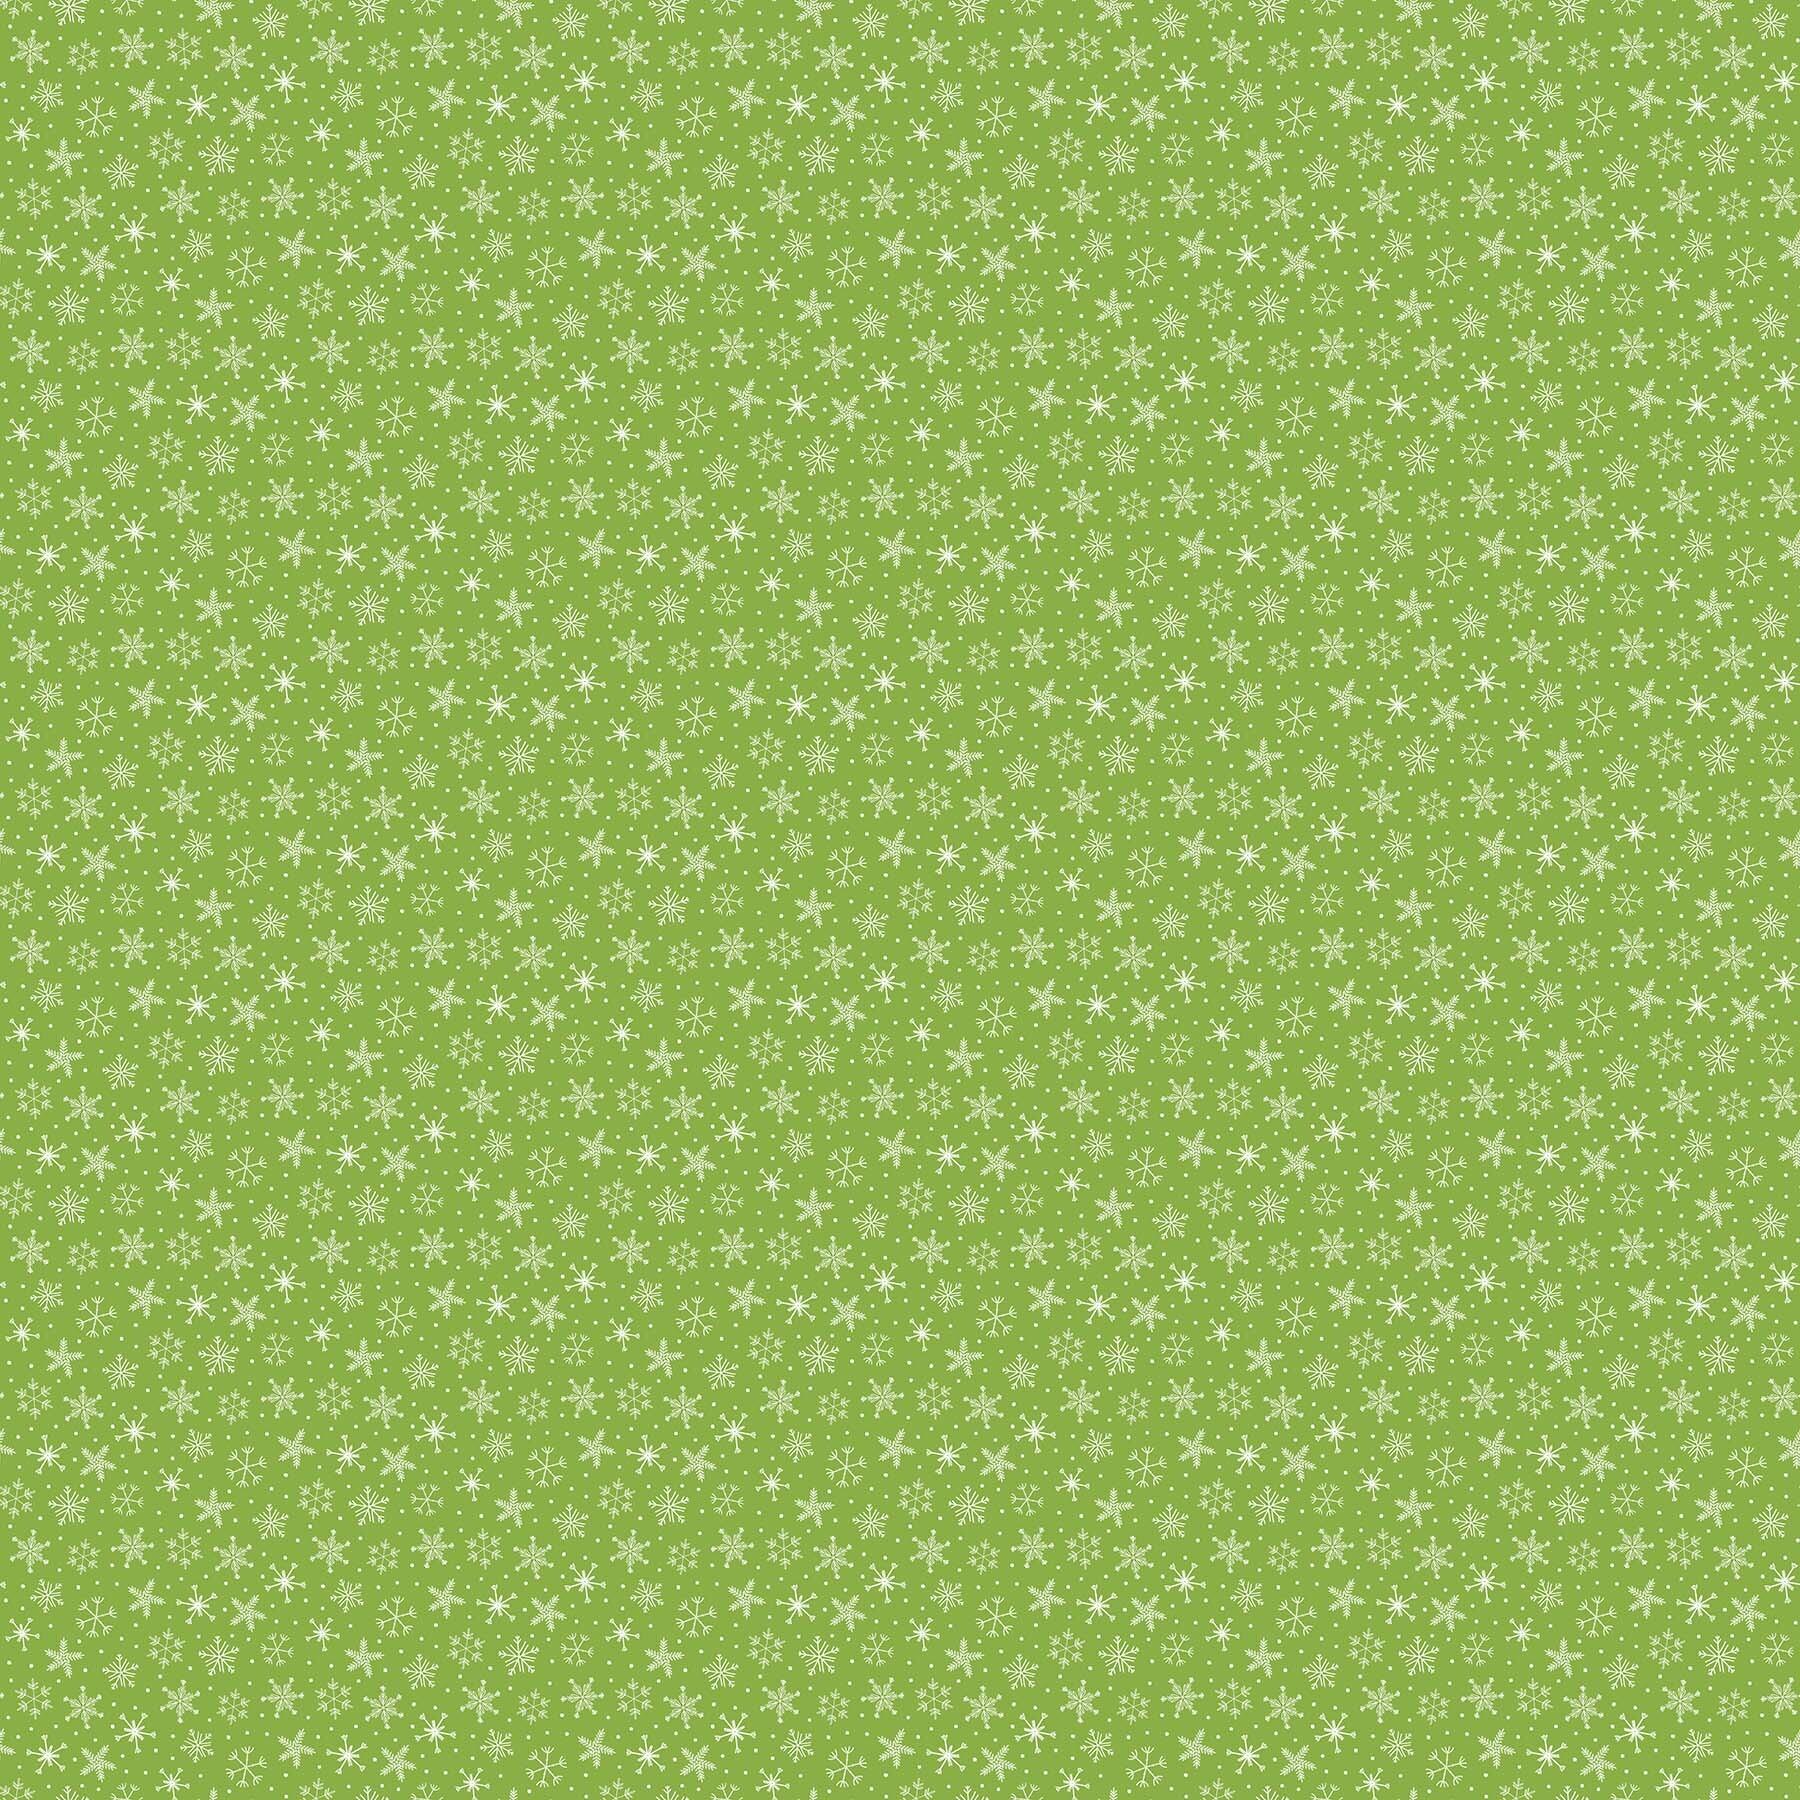 Santa Paws - Green Snowflake - 1/2m cut 58029